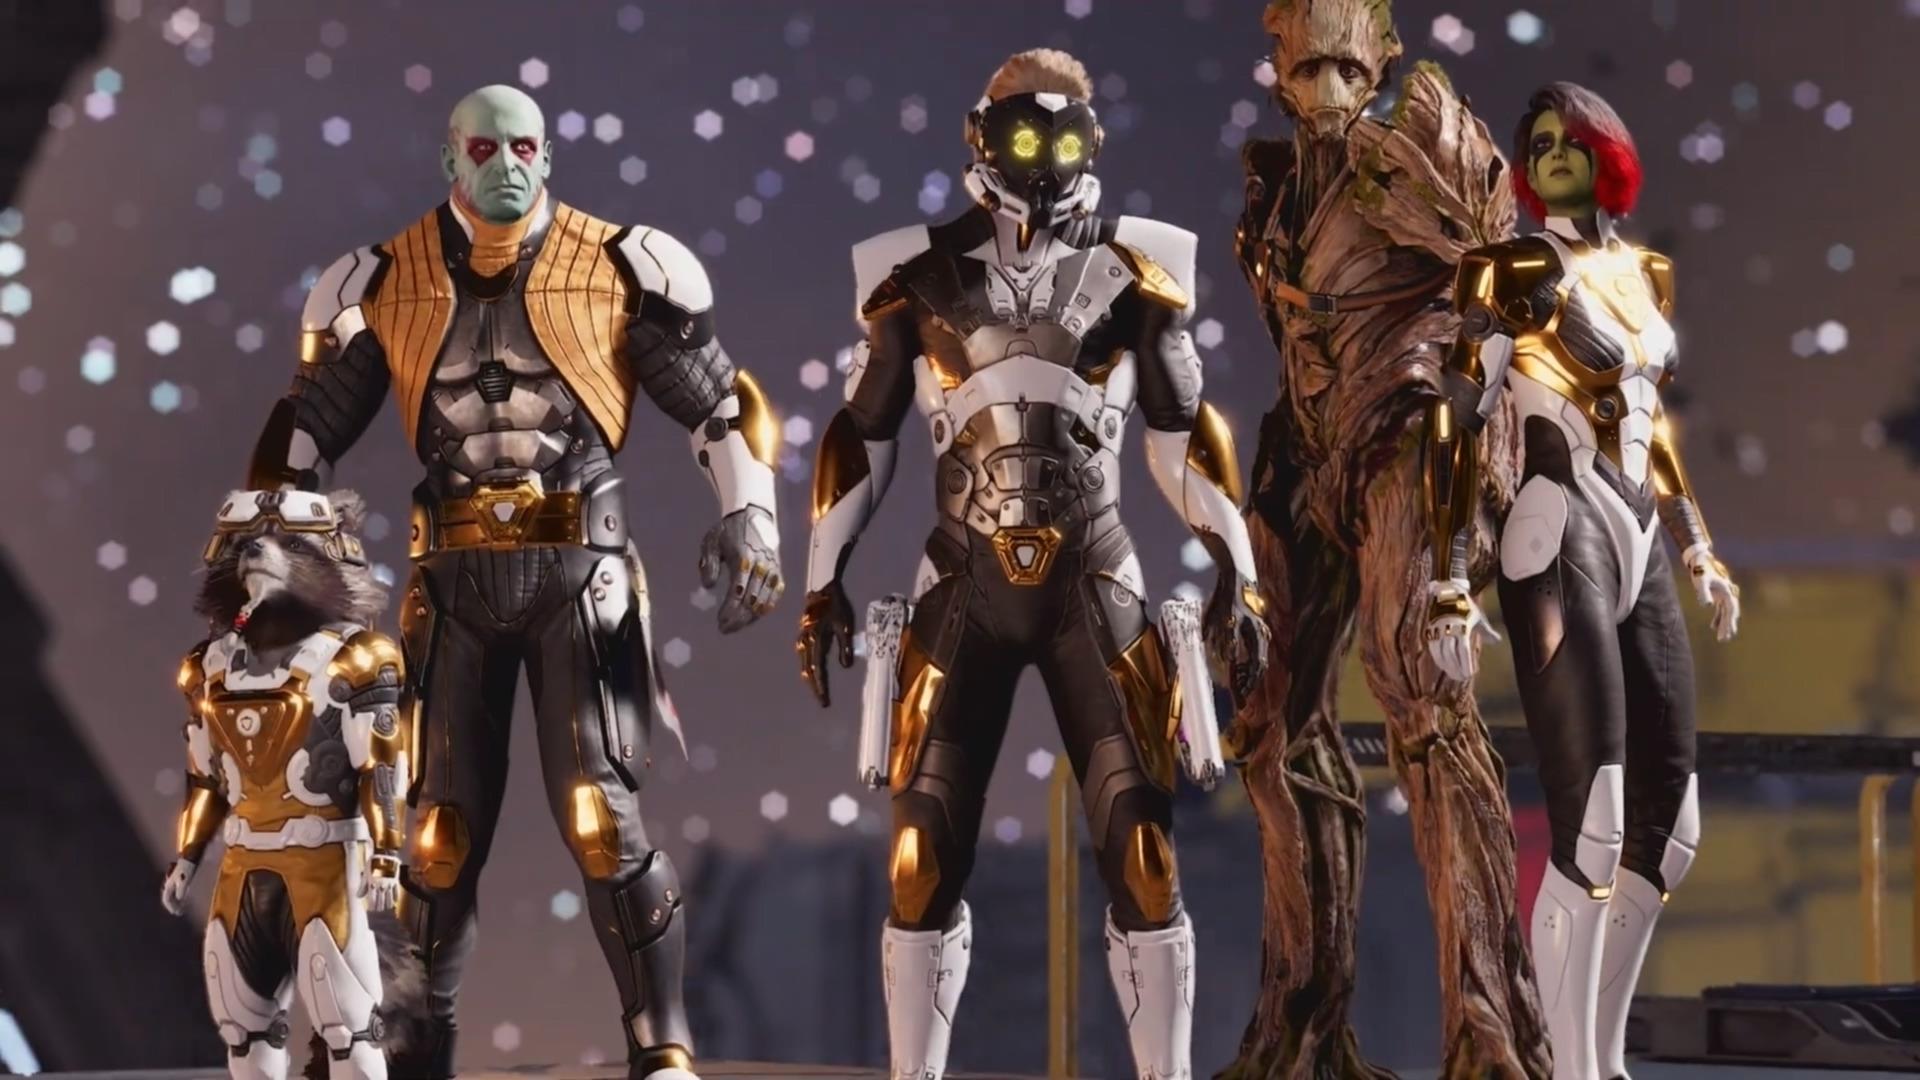 Trailer, Marvel, Square Enix, Adventure, Guardians of the Galaxy, Marvel's Guardians of the Galaxy, Eidos Montreal